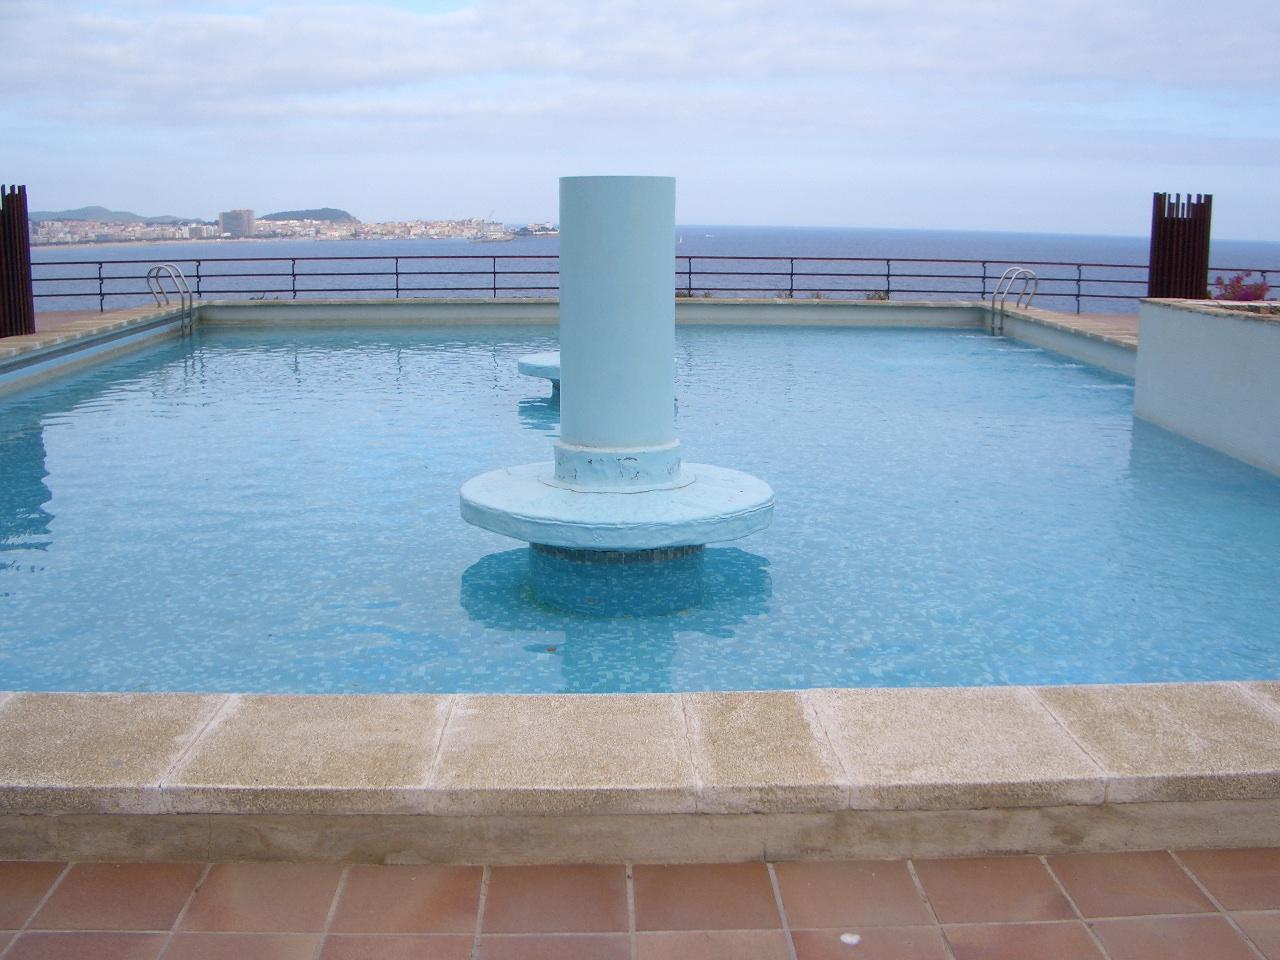 Rehabilitaci n piscina comunitaria en calonge for Rehabilitacion en piscina